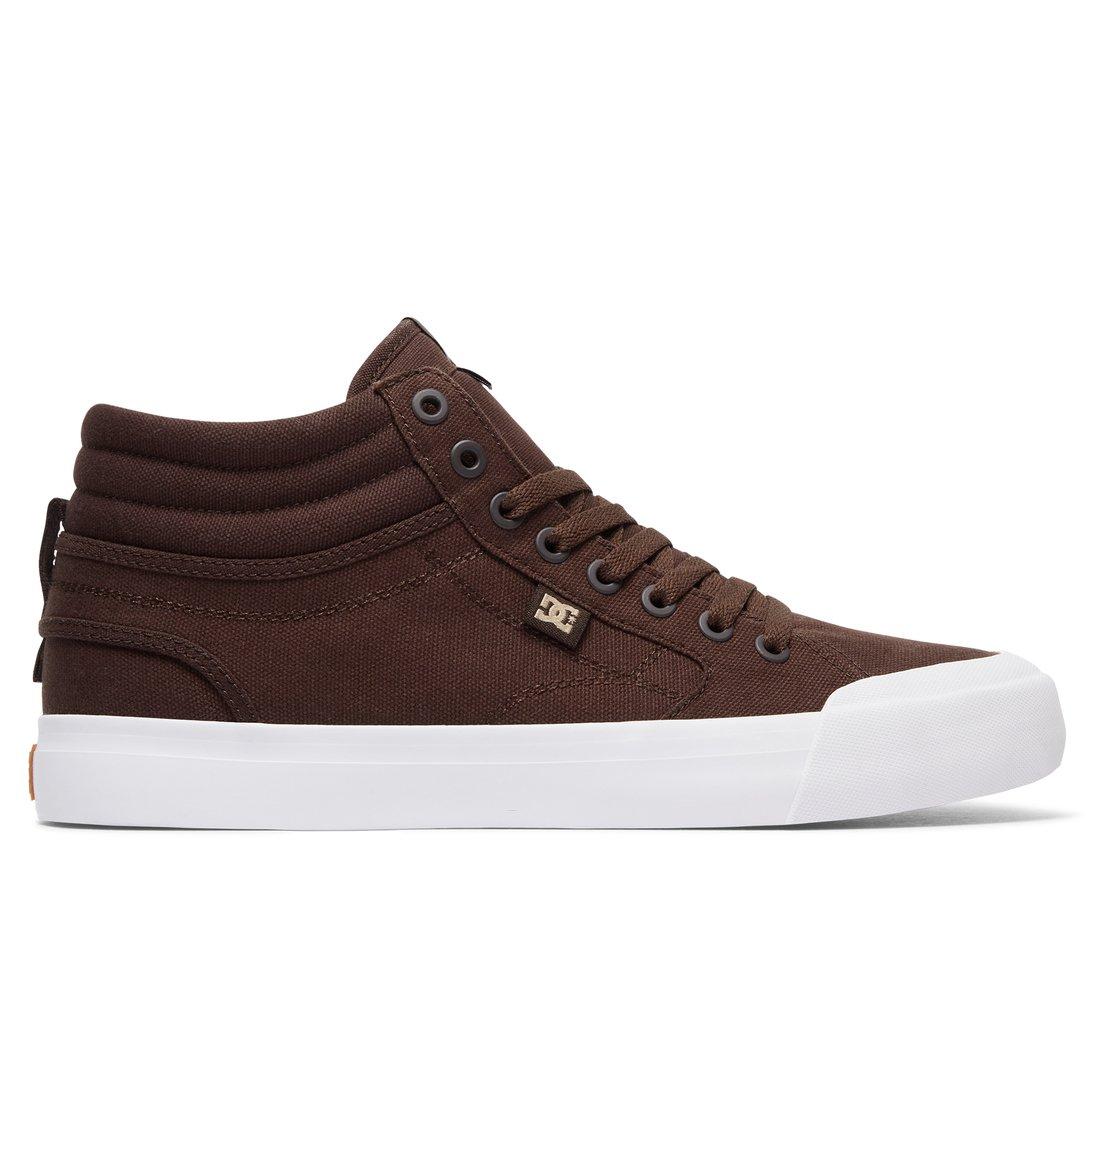 DC Burgundy Evan Smith Signature Series SE Womens Hi Top Shoe N5666